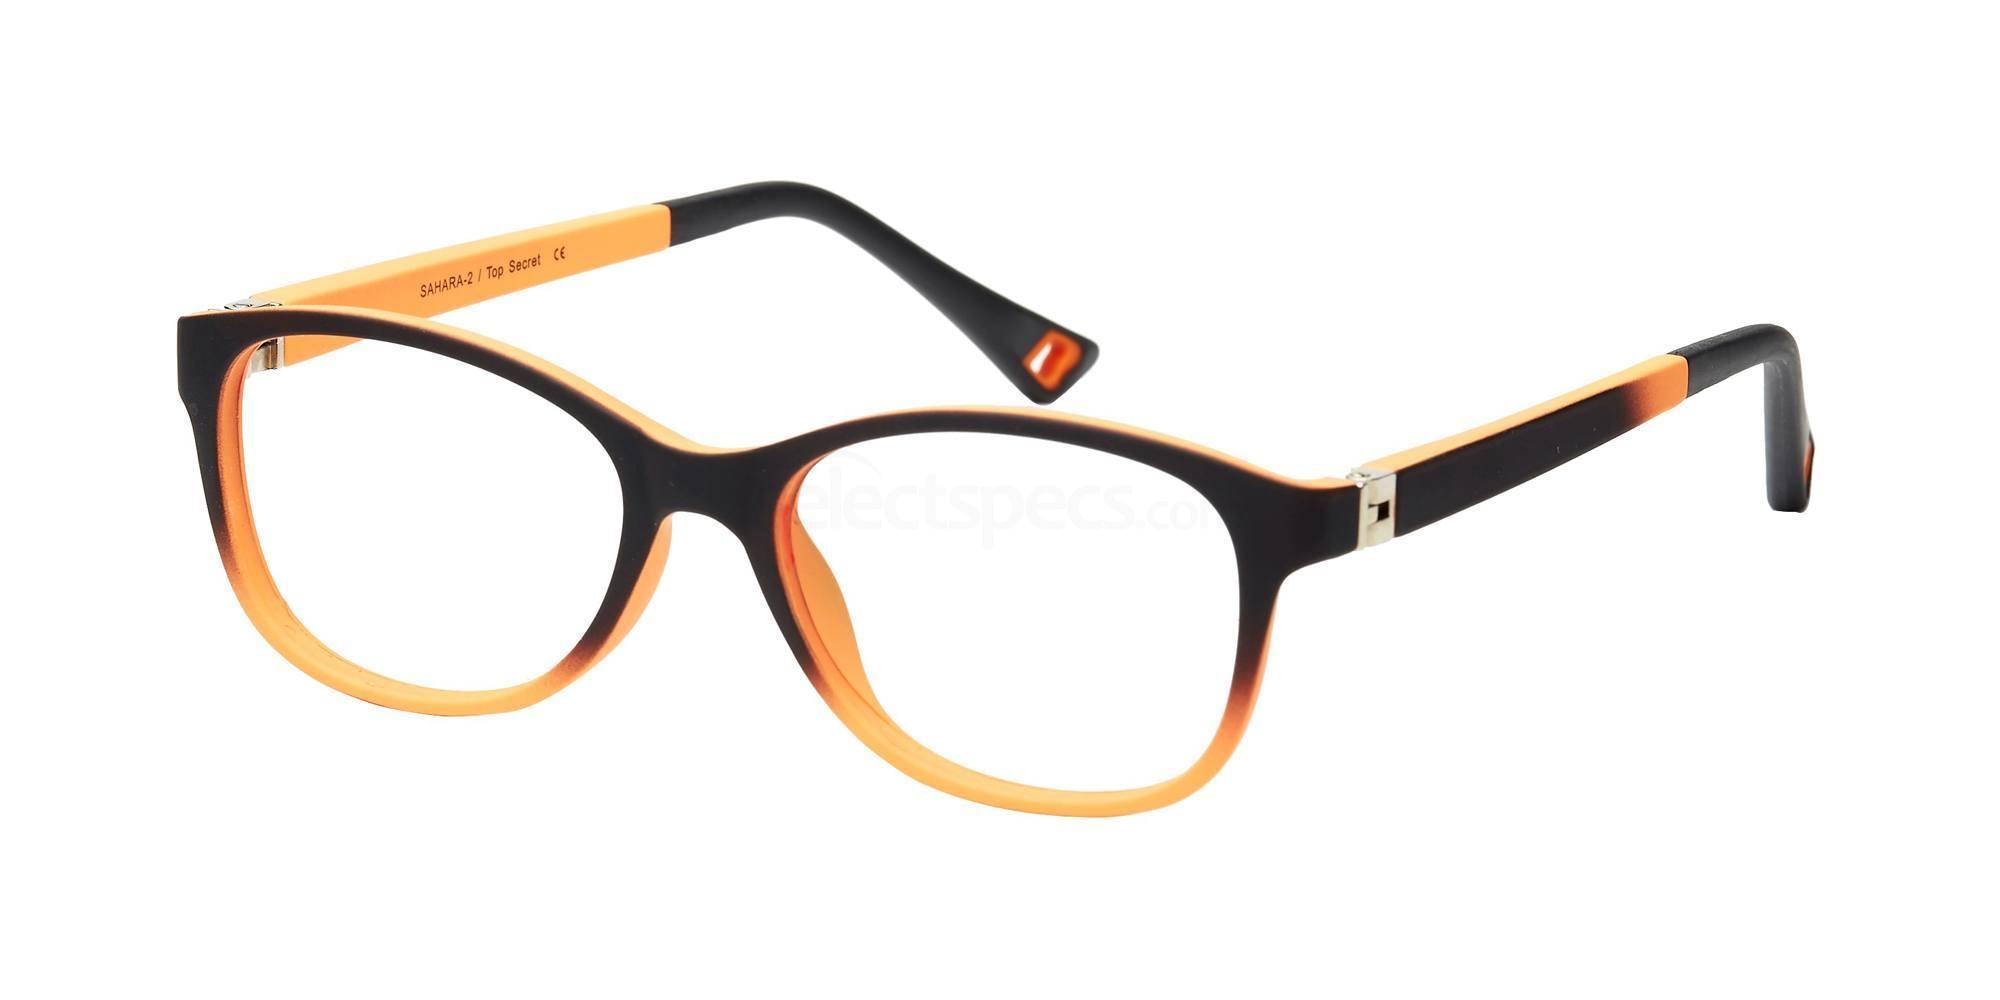 C2 SAHARA2 Glasses, Top Secret KIDS